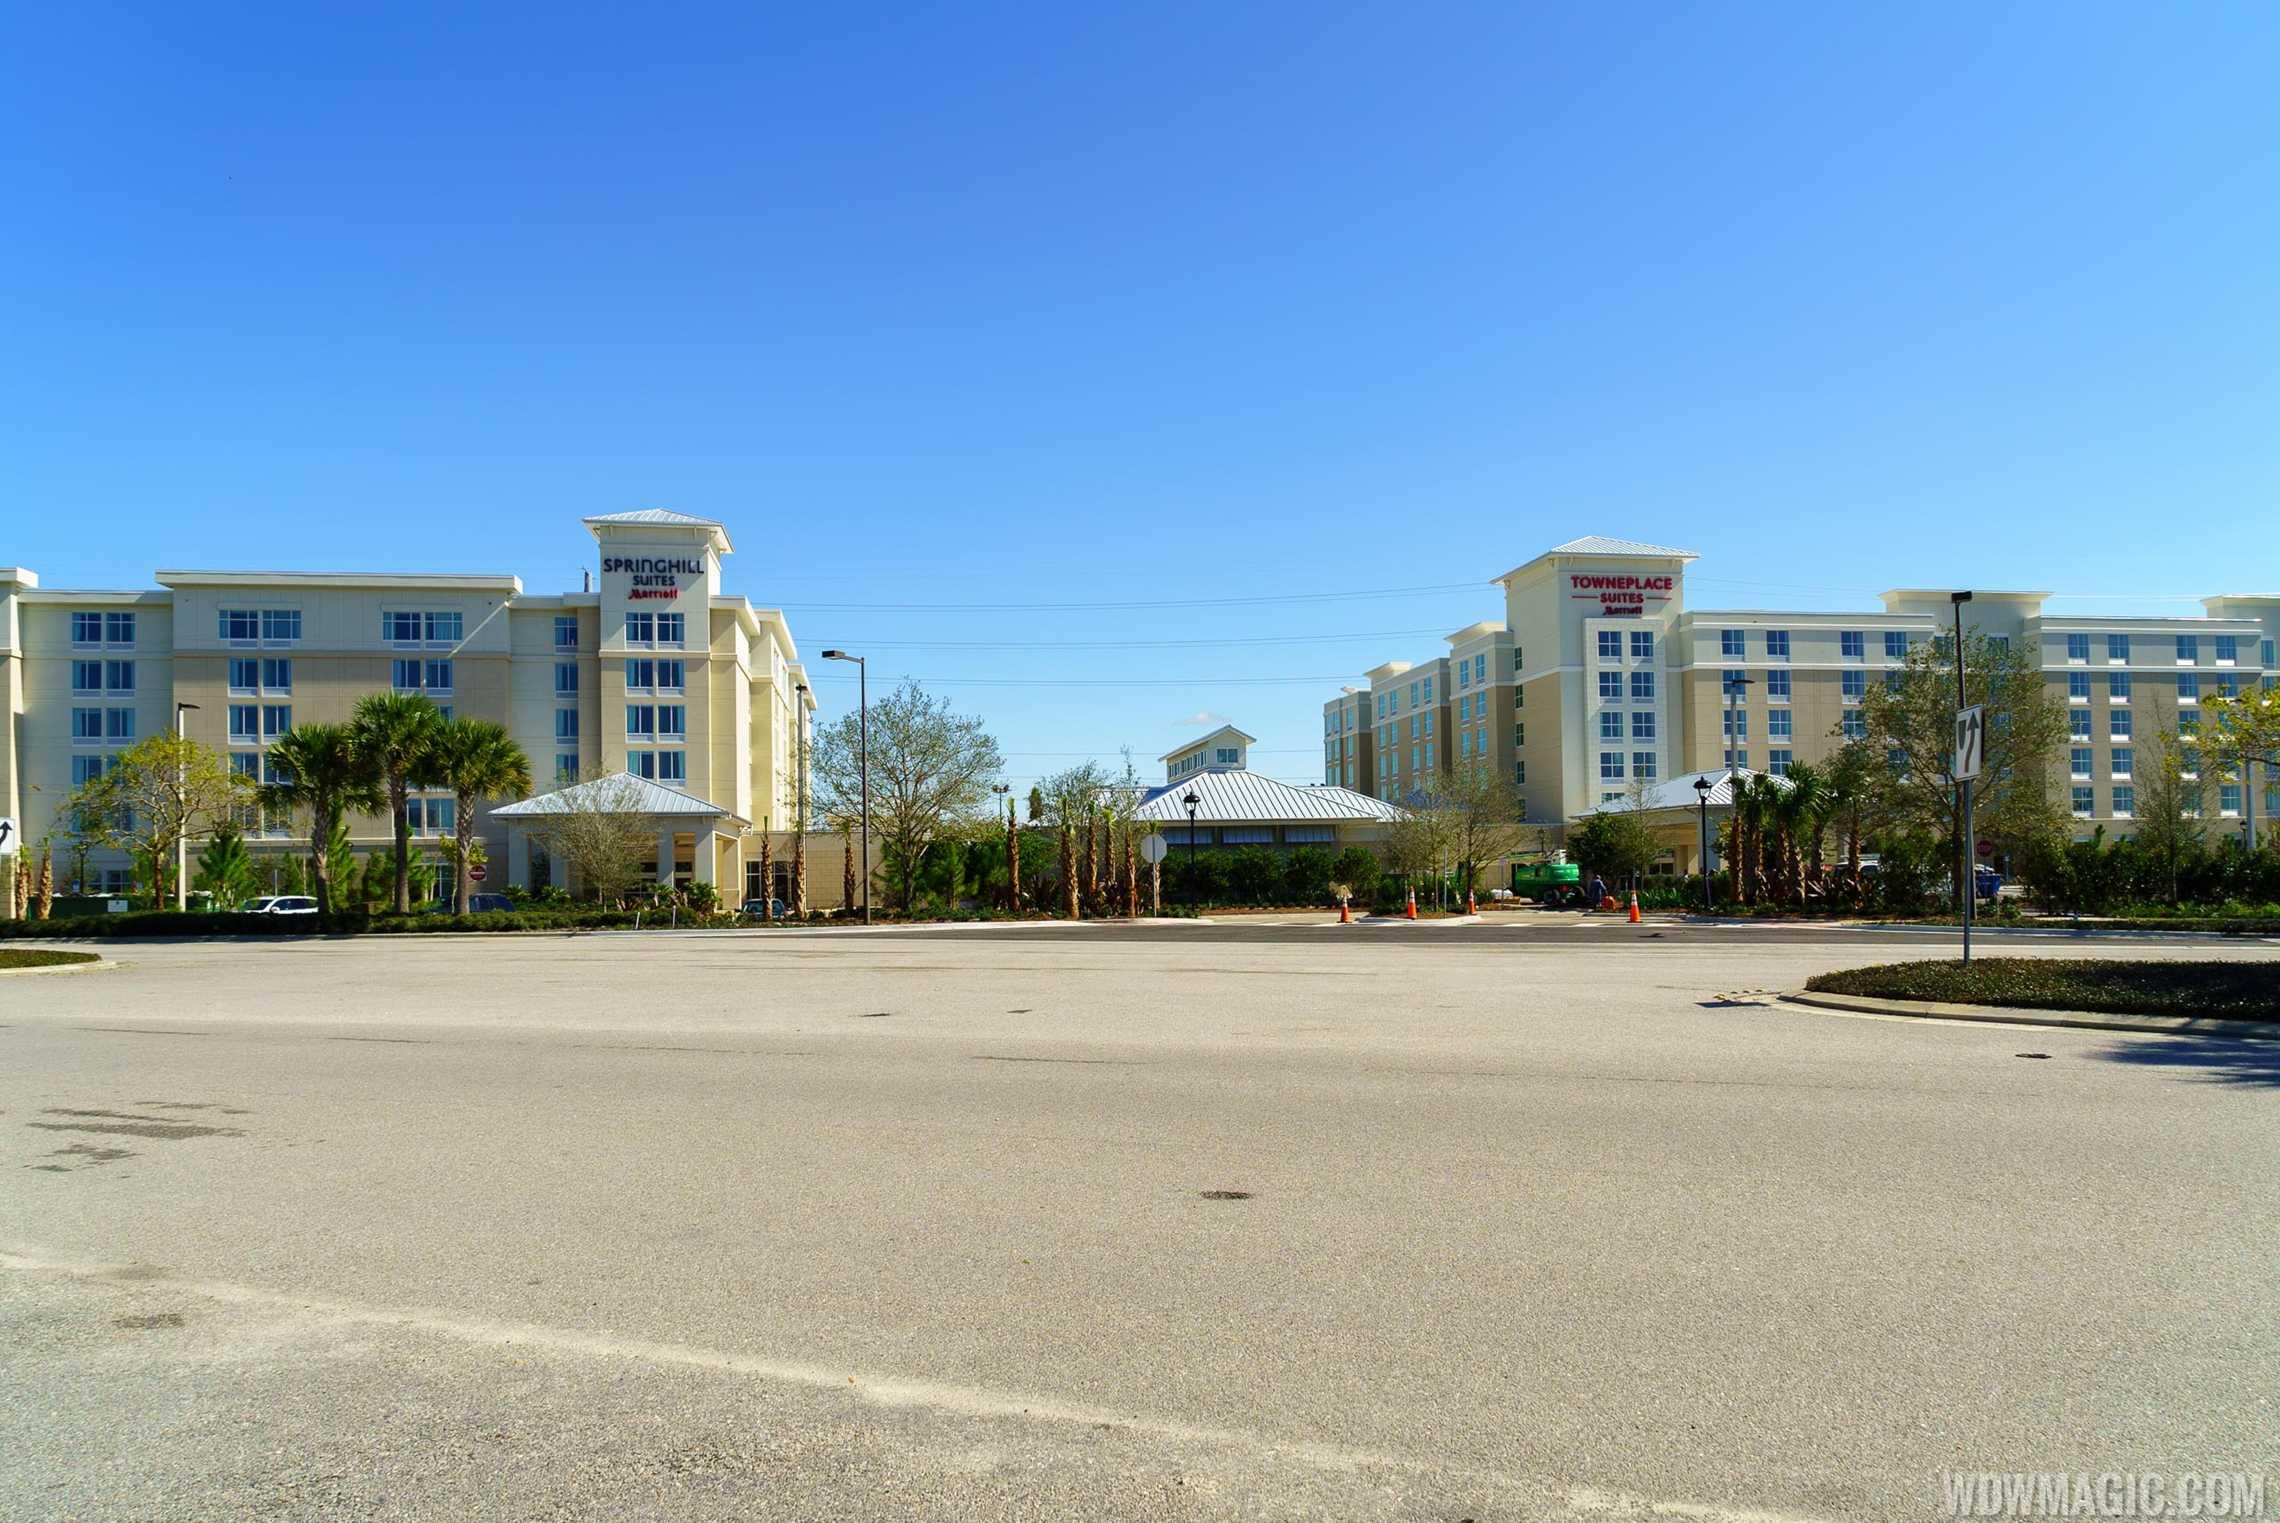 Marriott Hotels at Flamingo Crossings